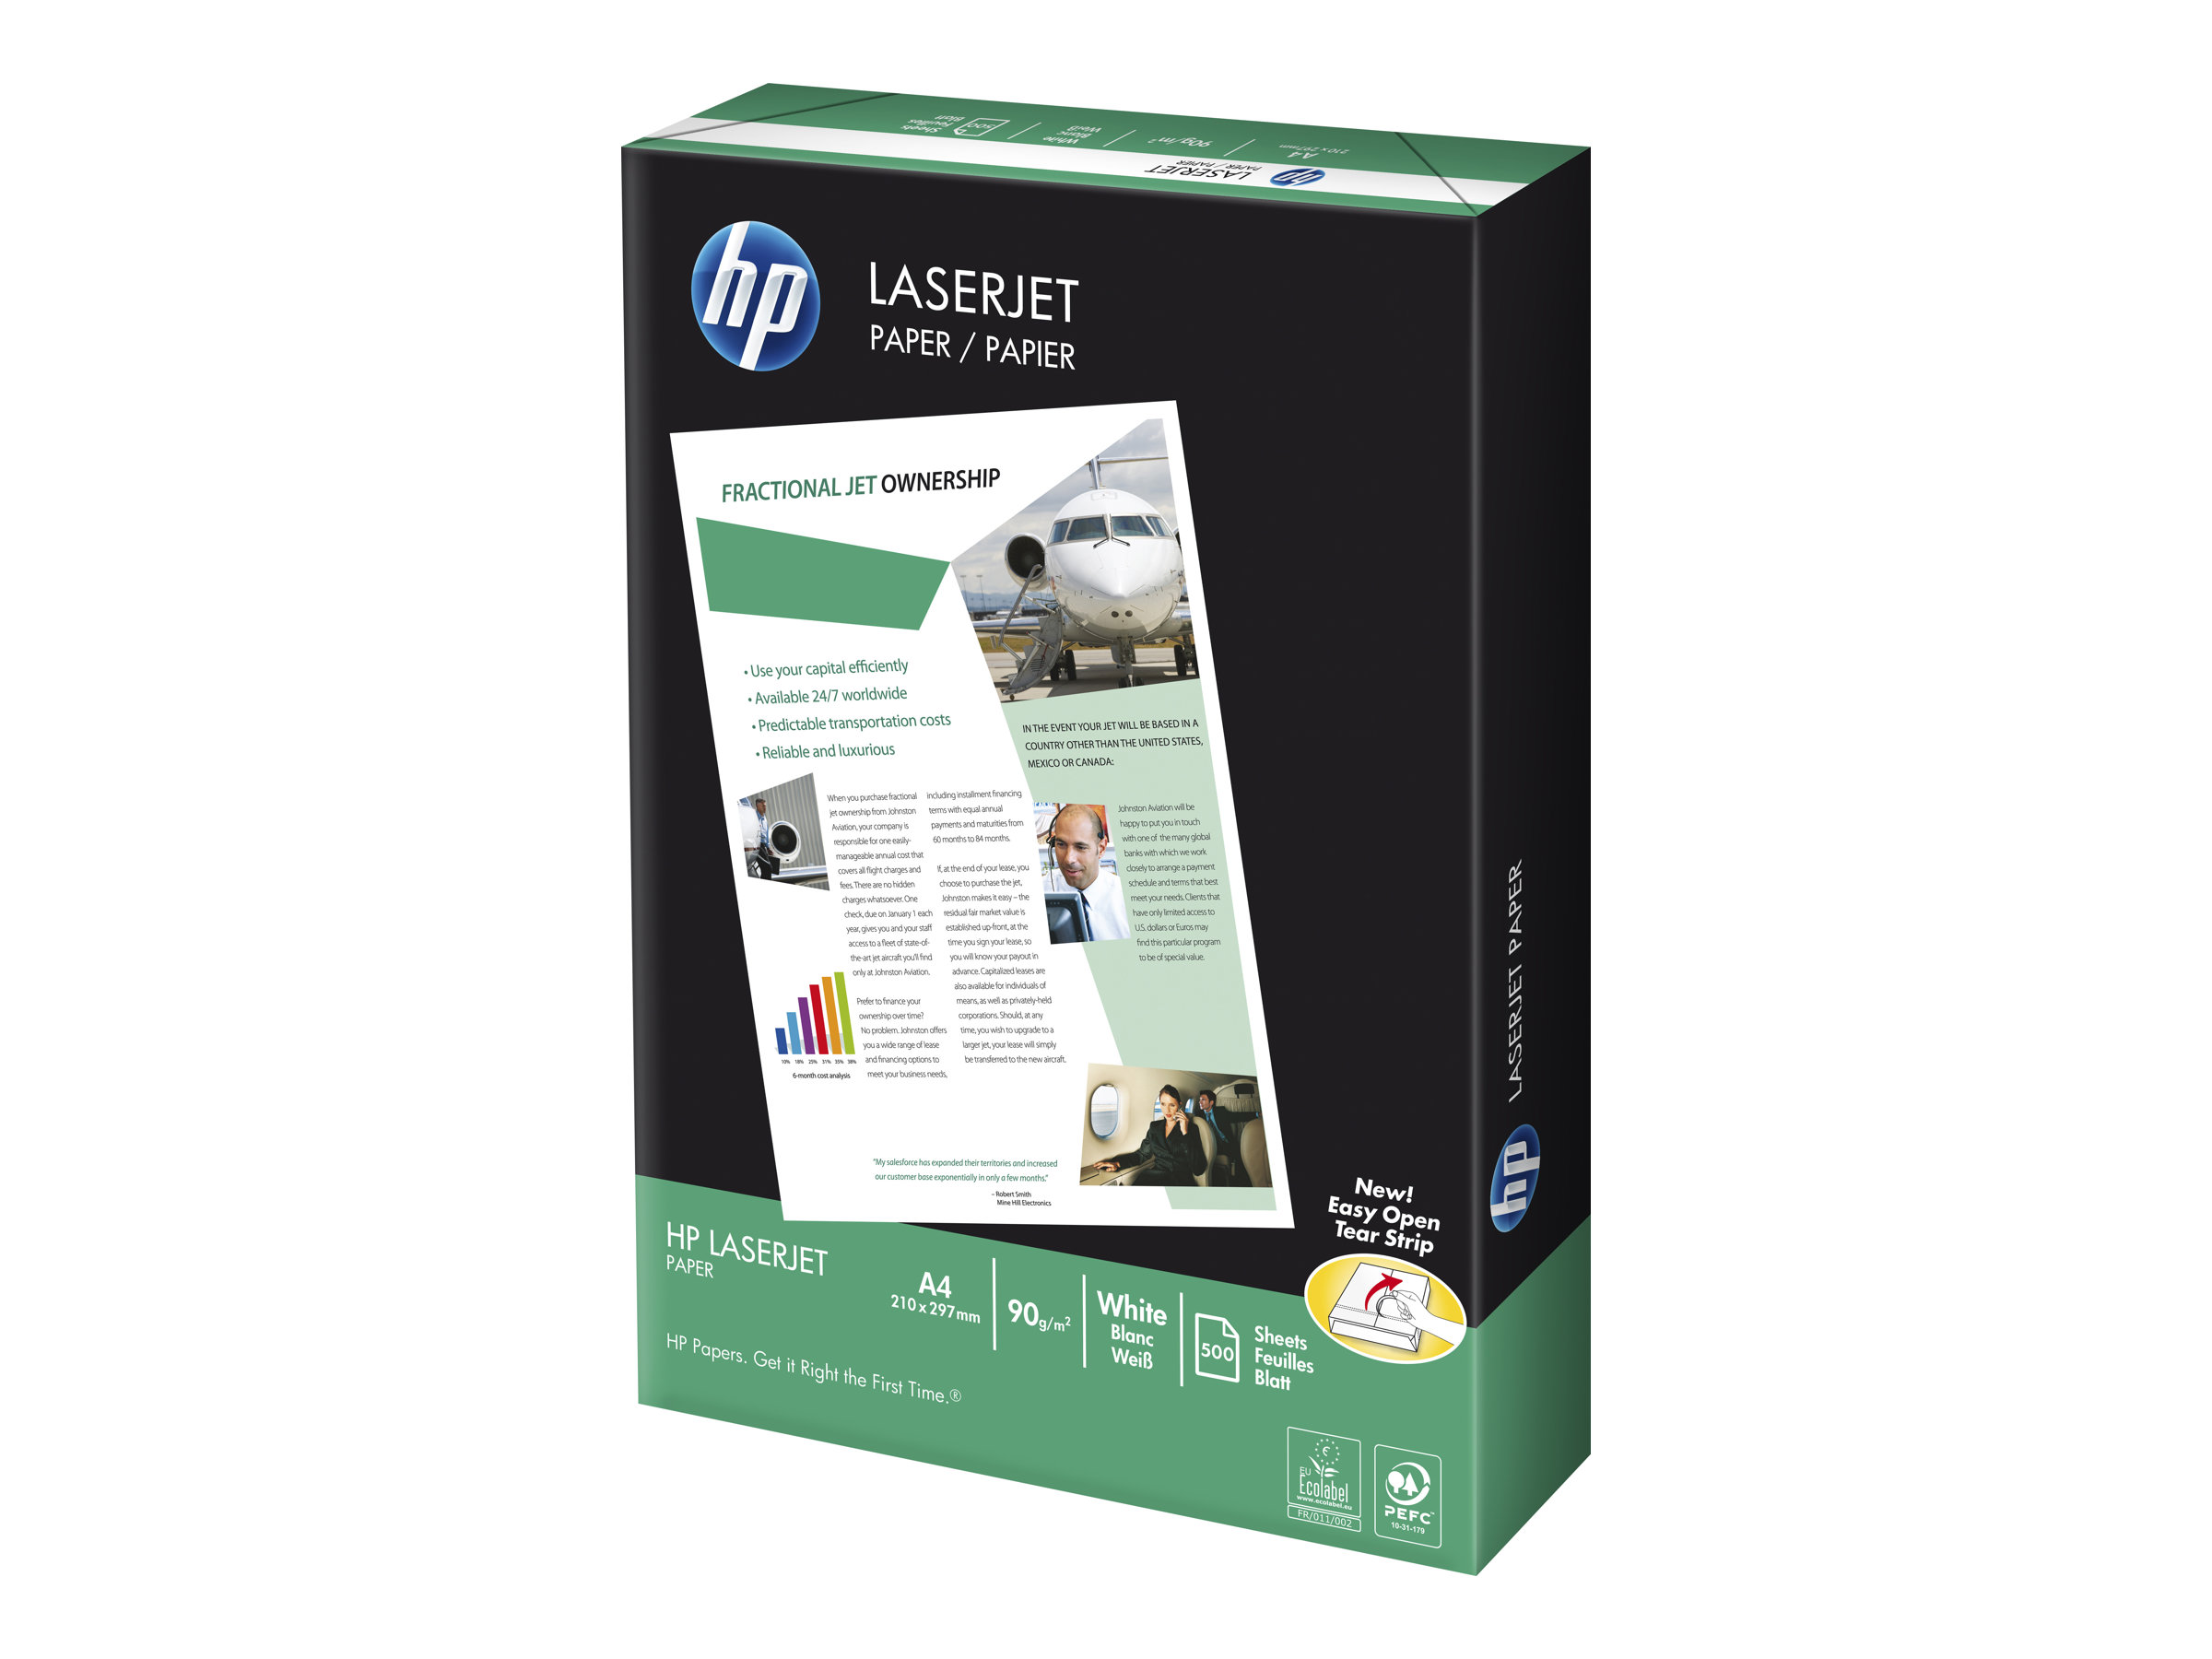 HP CHP310 - Normalpapier - 500 Blatt (1er Packung)